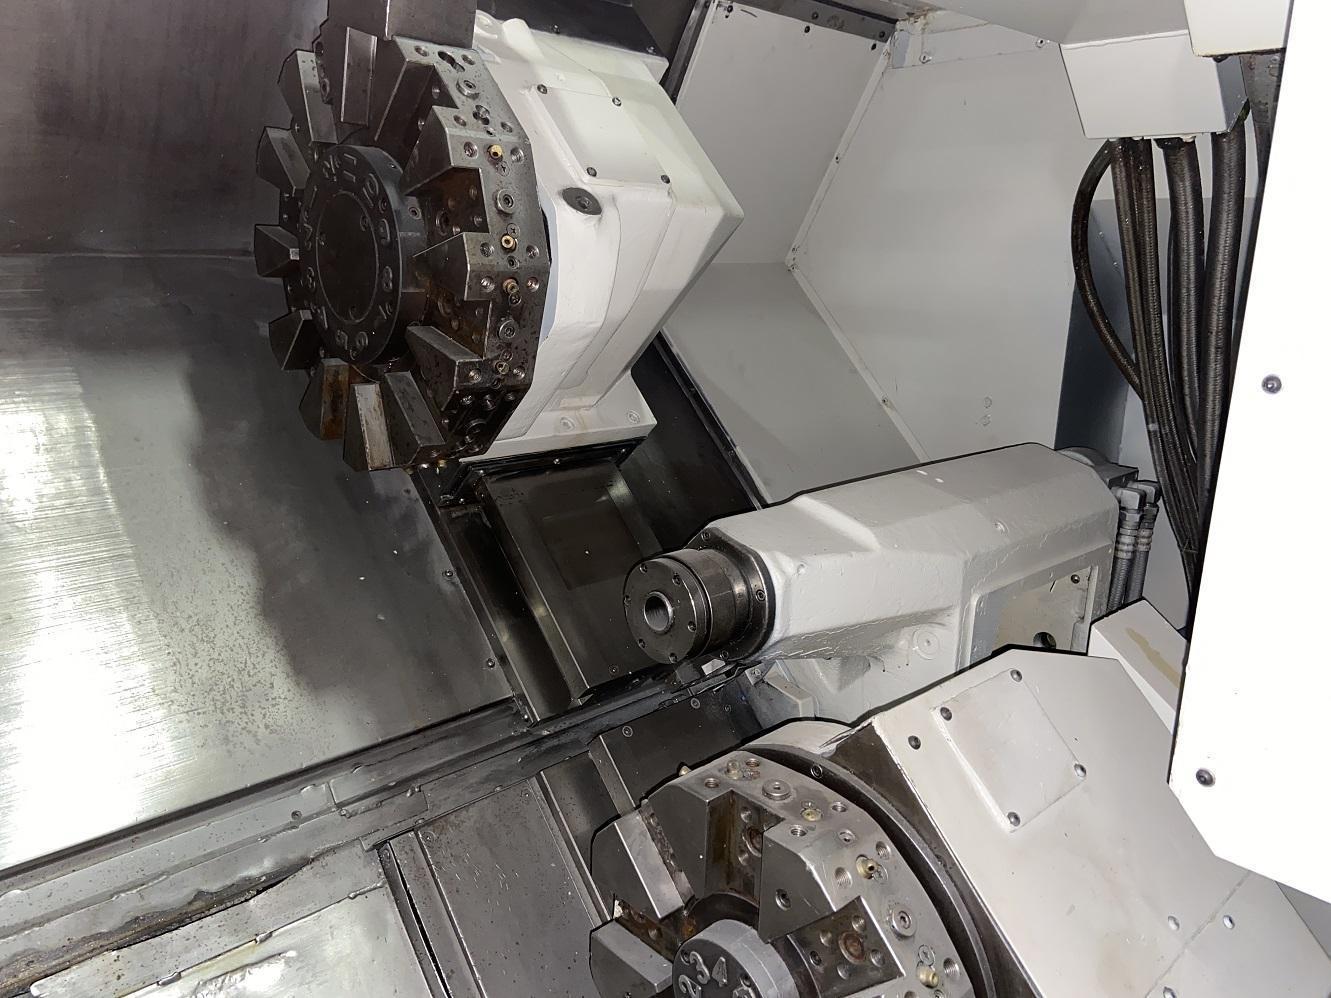 2008 OKUMA SimulTurn LU-300 - CNC Horizontal Lathe